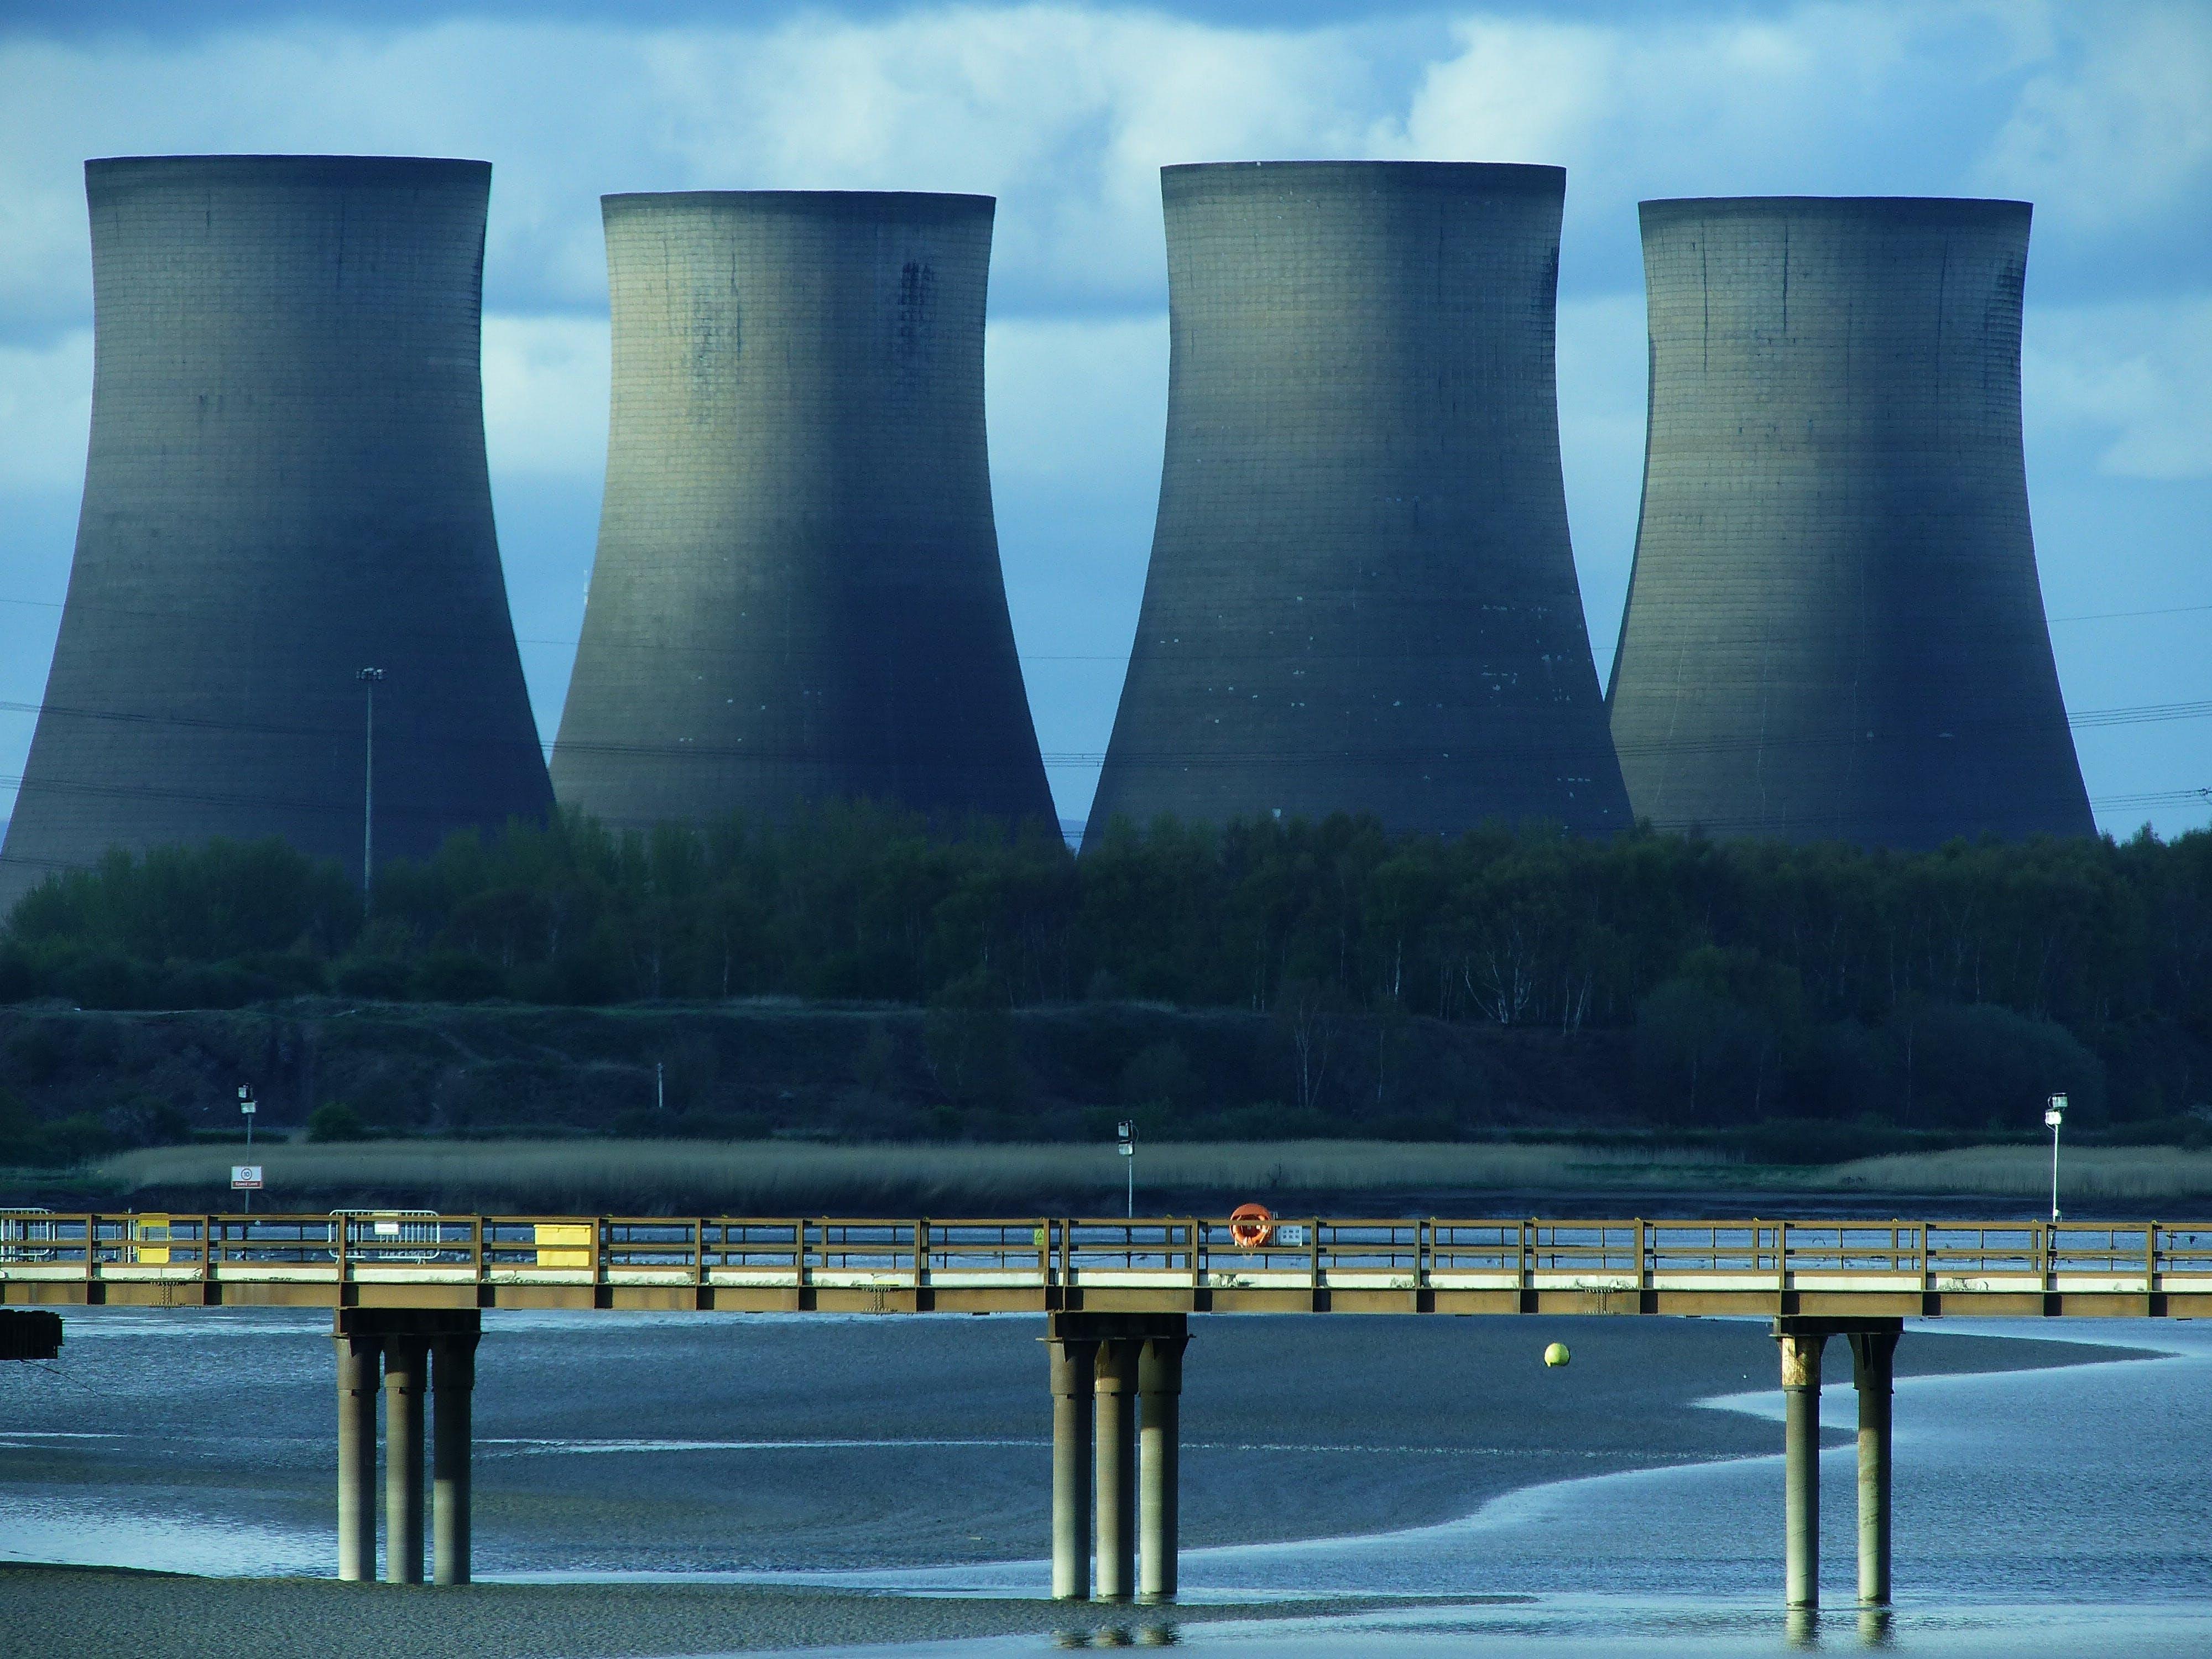 Gratis lagerfoto af bro, damp, energi, hav